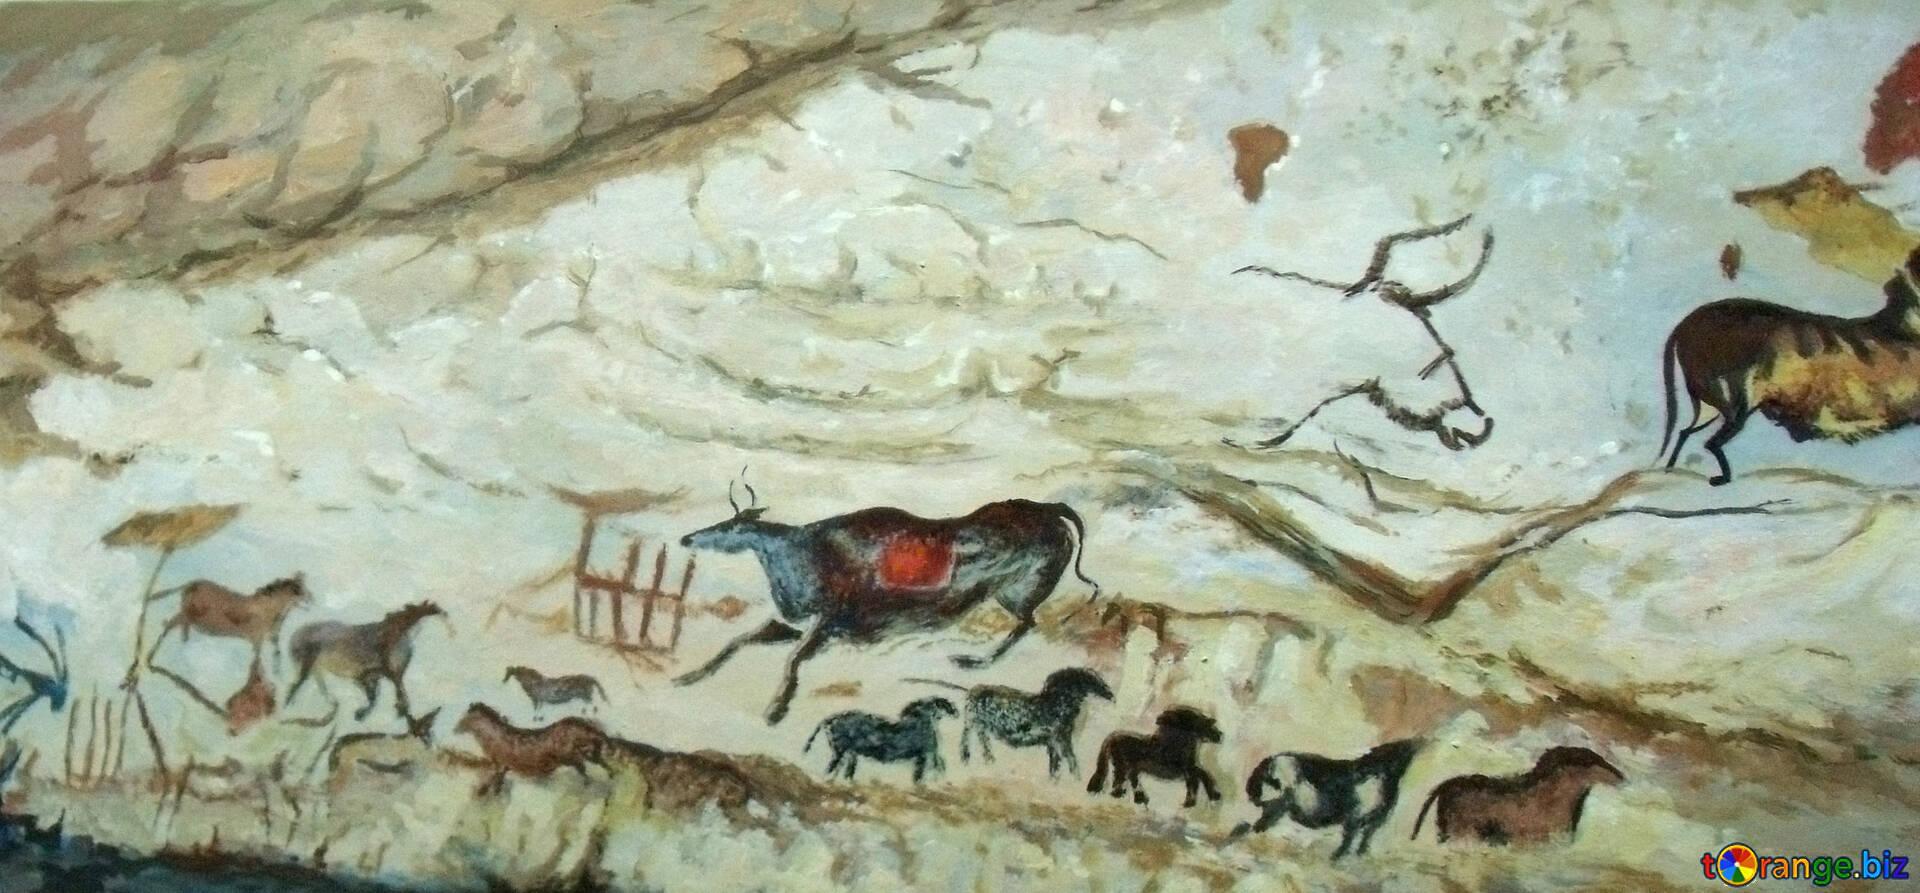 antiques-prehistoric-art-rock-painting-2